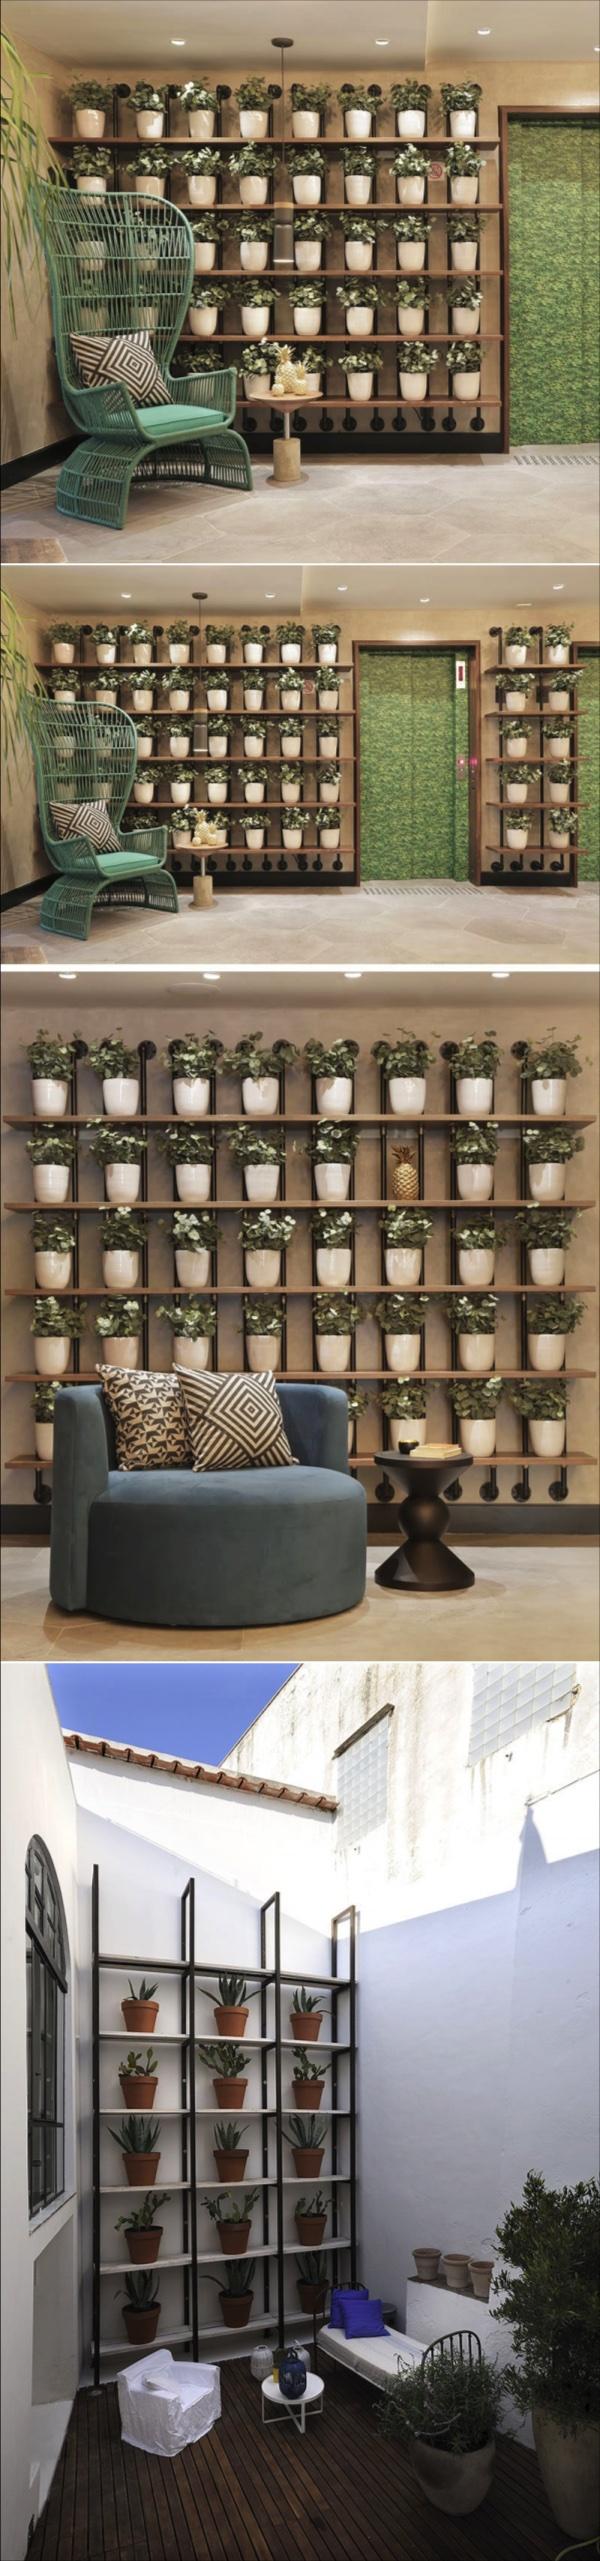 Wall decor idea u create a grid of identical planters for a